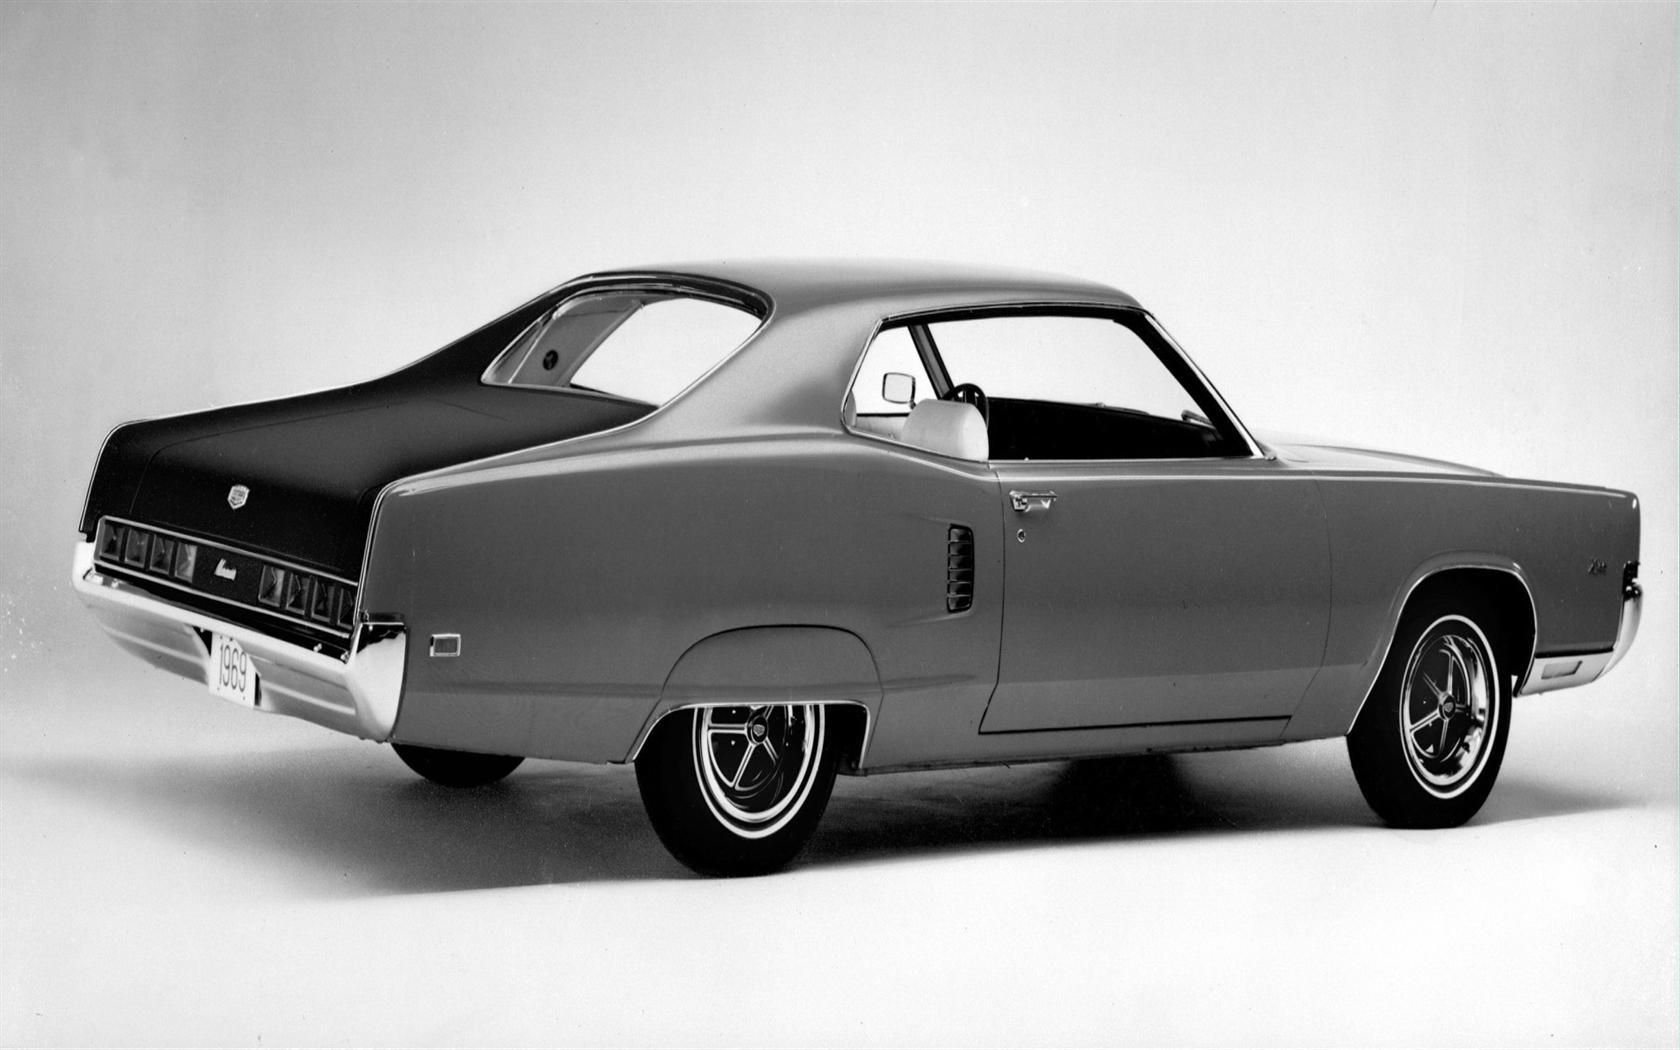 1969 Mercury Marauder Image Https Www Conceptcarz Com